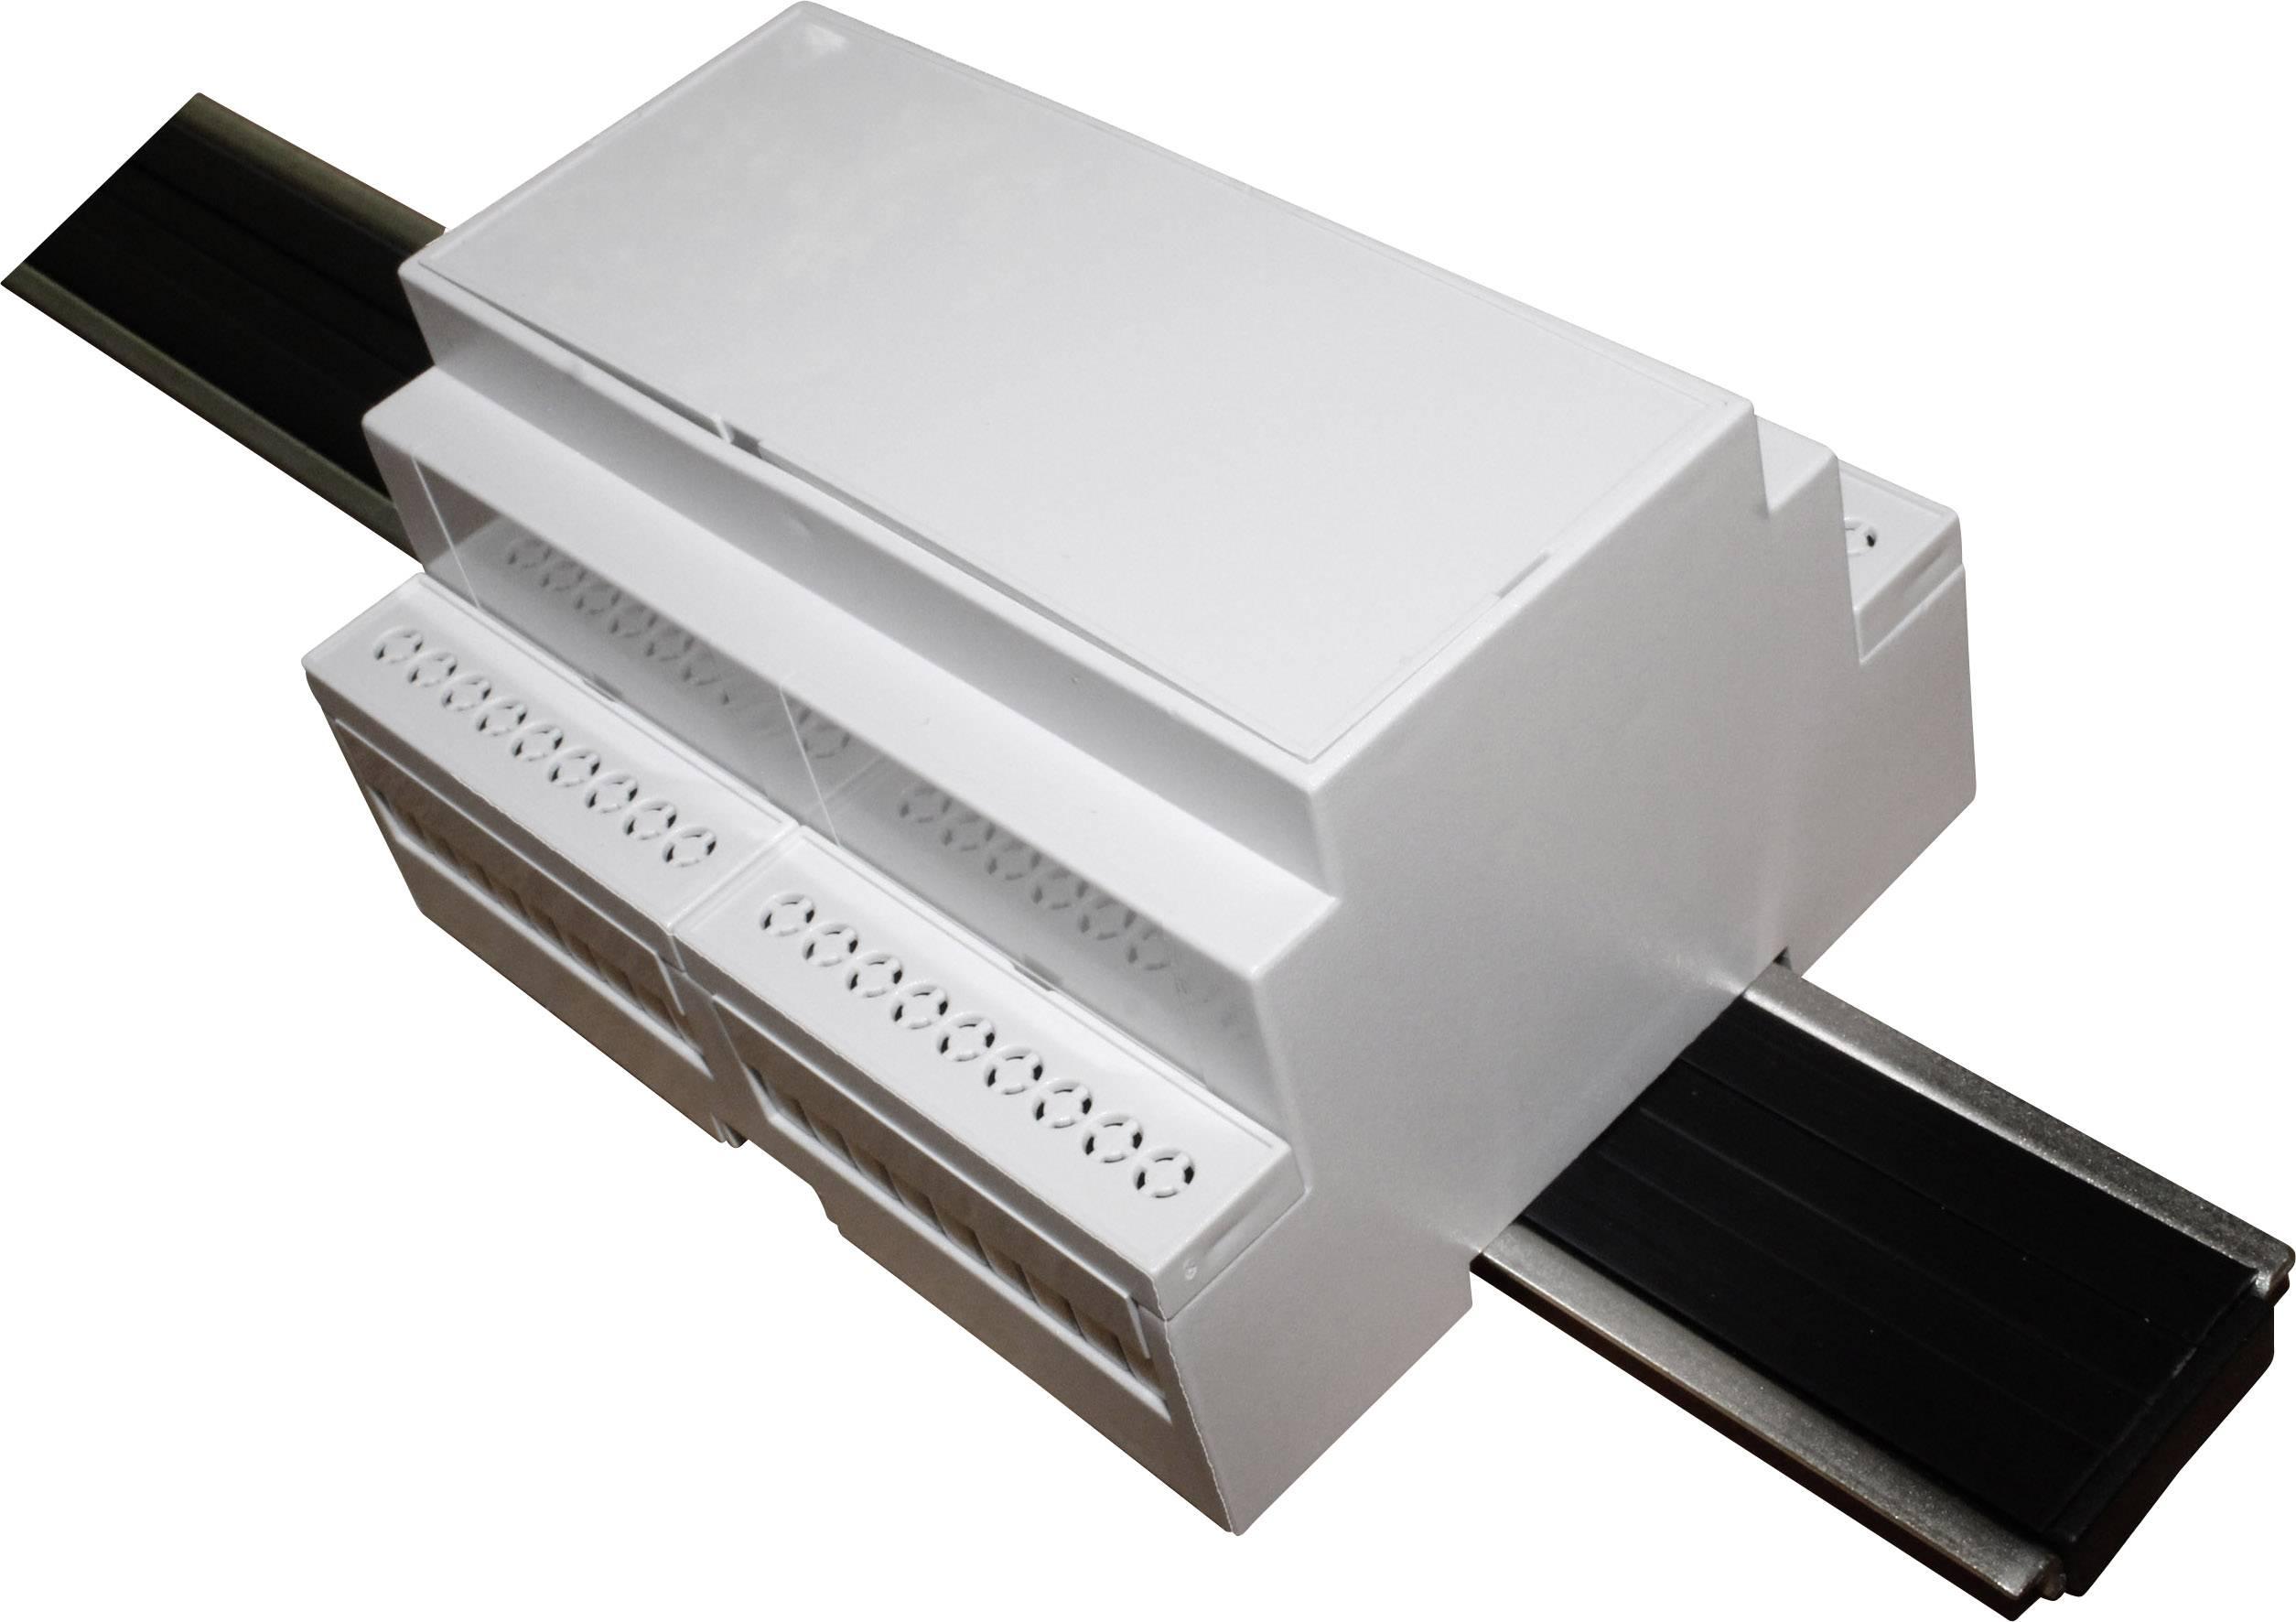 Pouzdro na DIN lištu Axxatronic CNMB/6/KIT/ACTIVE25-CON pro montáž na DIN lištu , 58 x 106 x 90 , polykarbonát, šedá, 1 ks